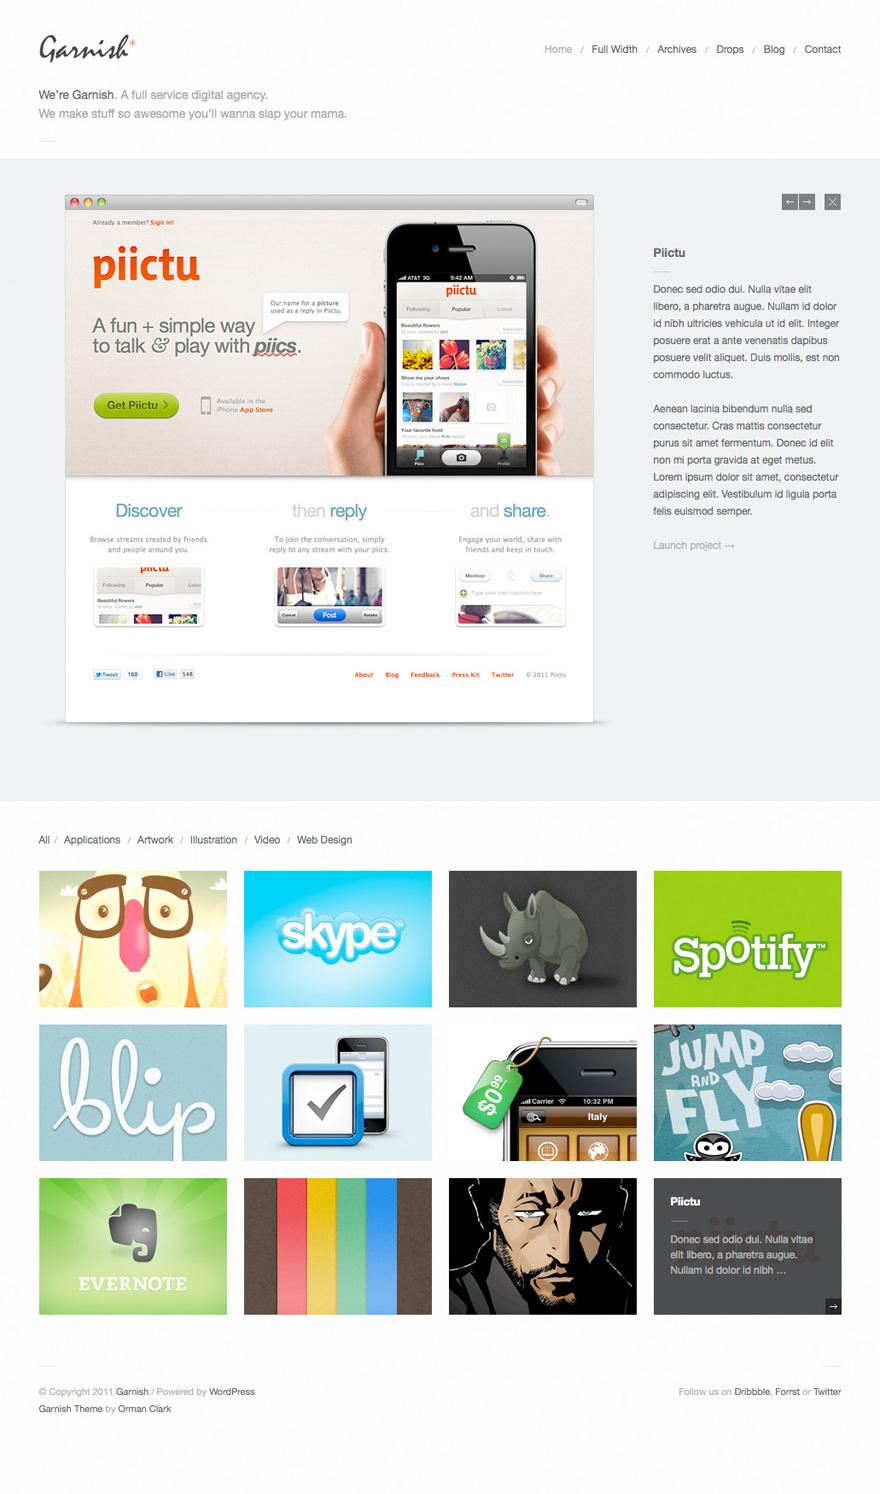 Garnish: Clean-Cut WordPress Portfolio Theme – 国外网页主题模板设计案例精选 - 任刚 · Ren Gang 世界设计 · 设计世界